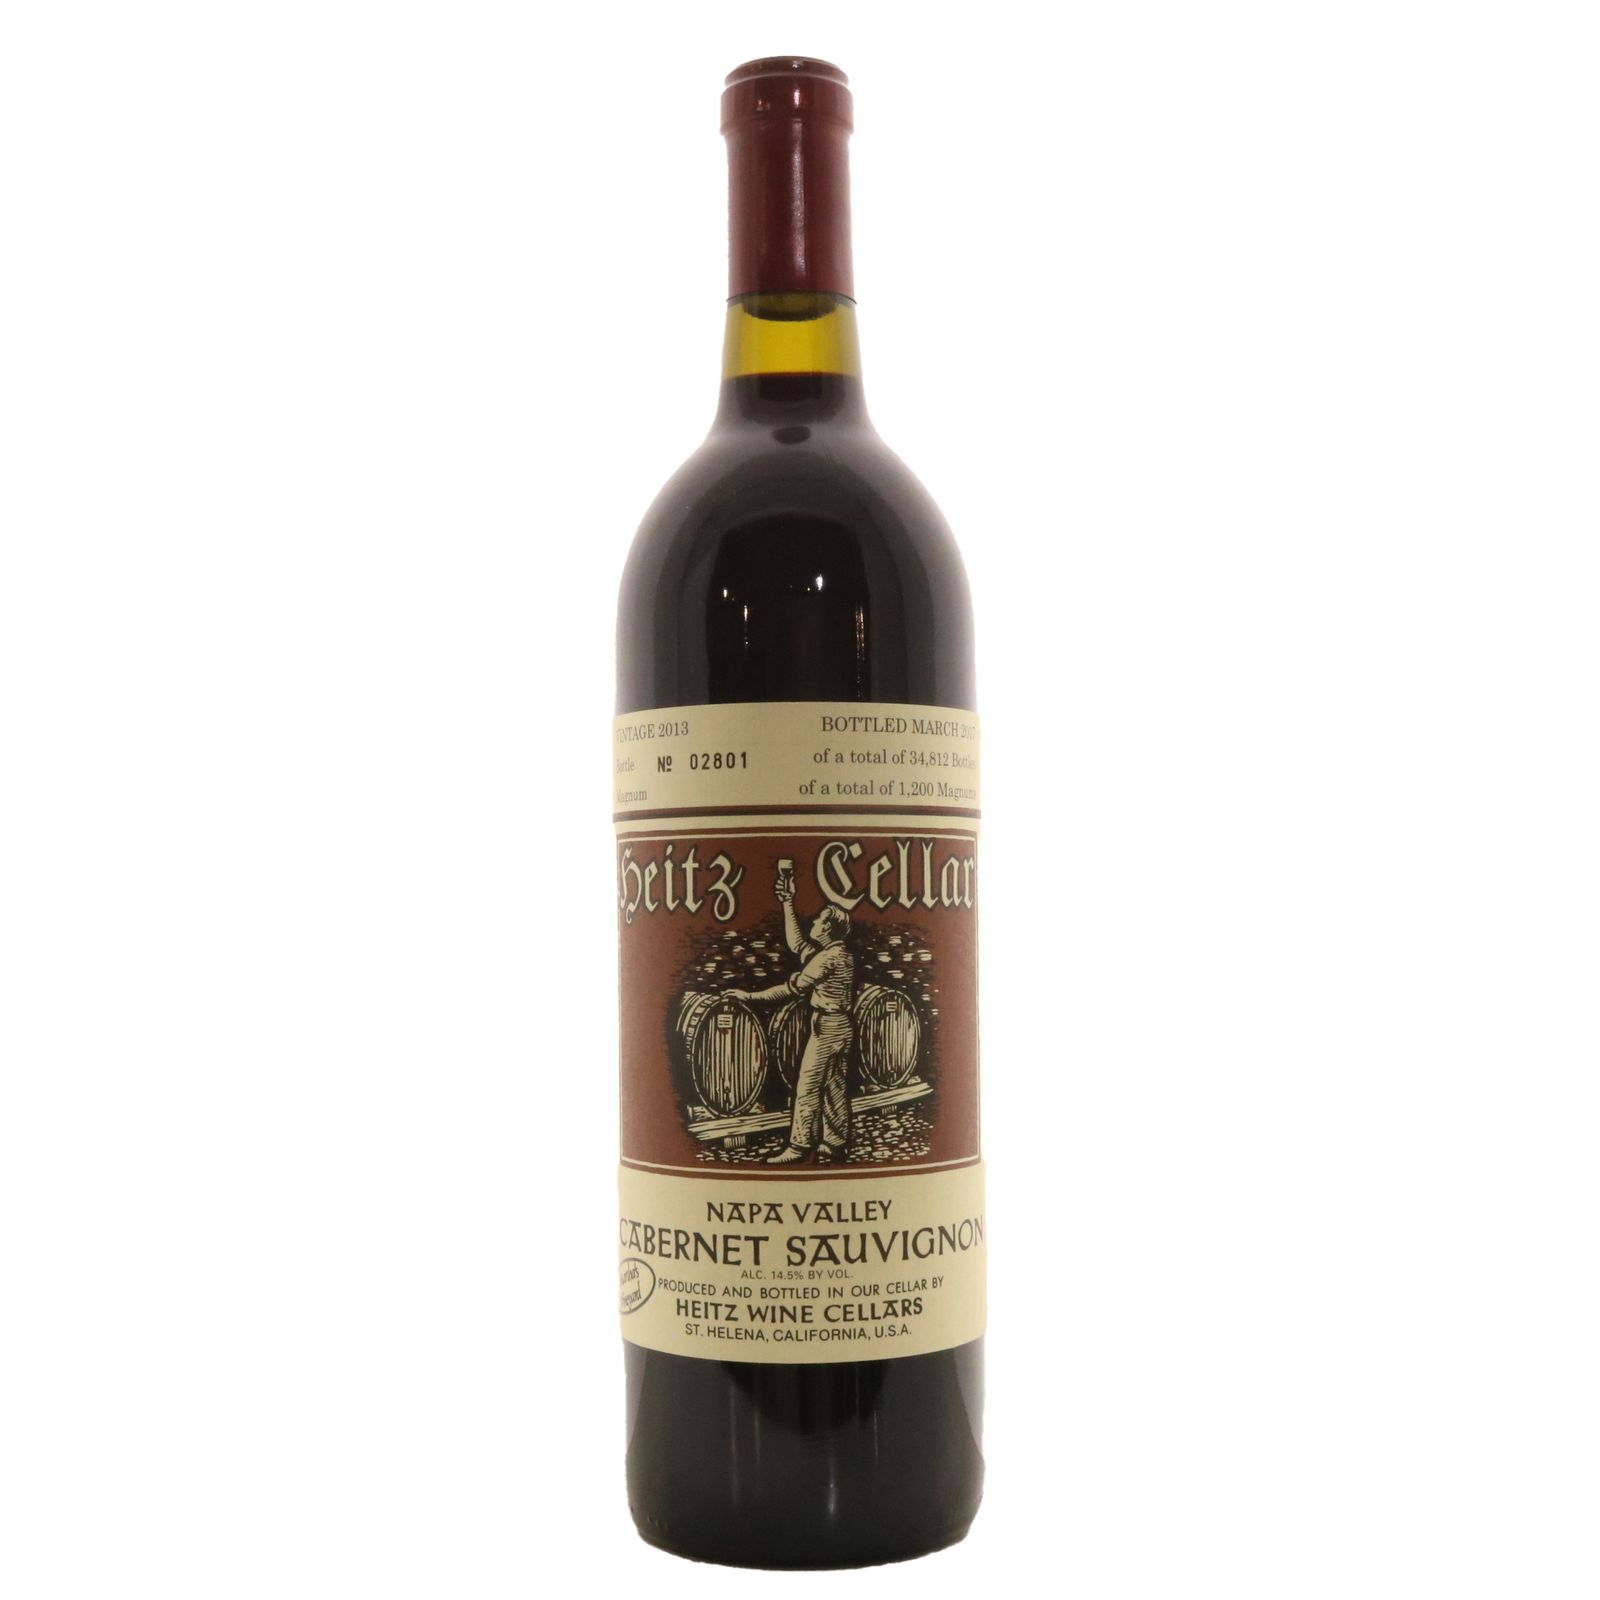 Martha´s Vineyard Cabernet Sauvignon 2013, Heitz, Napa Valley, USA